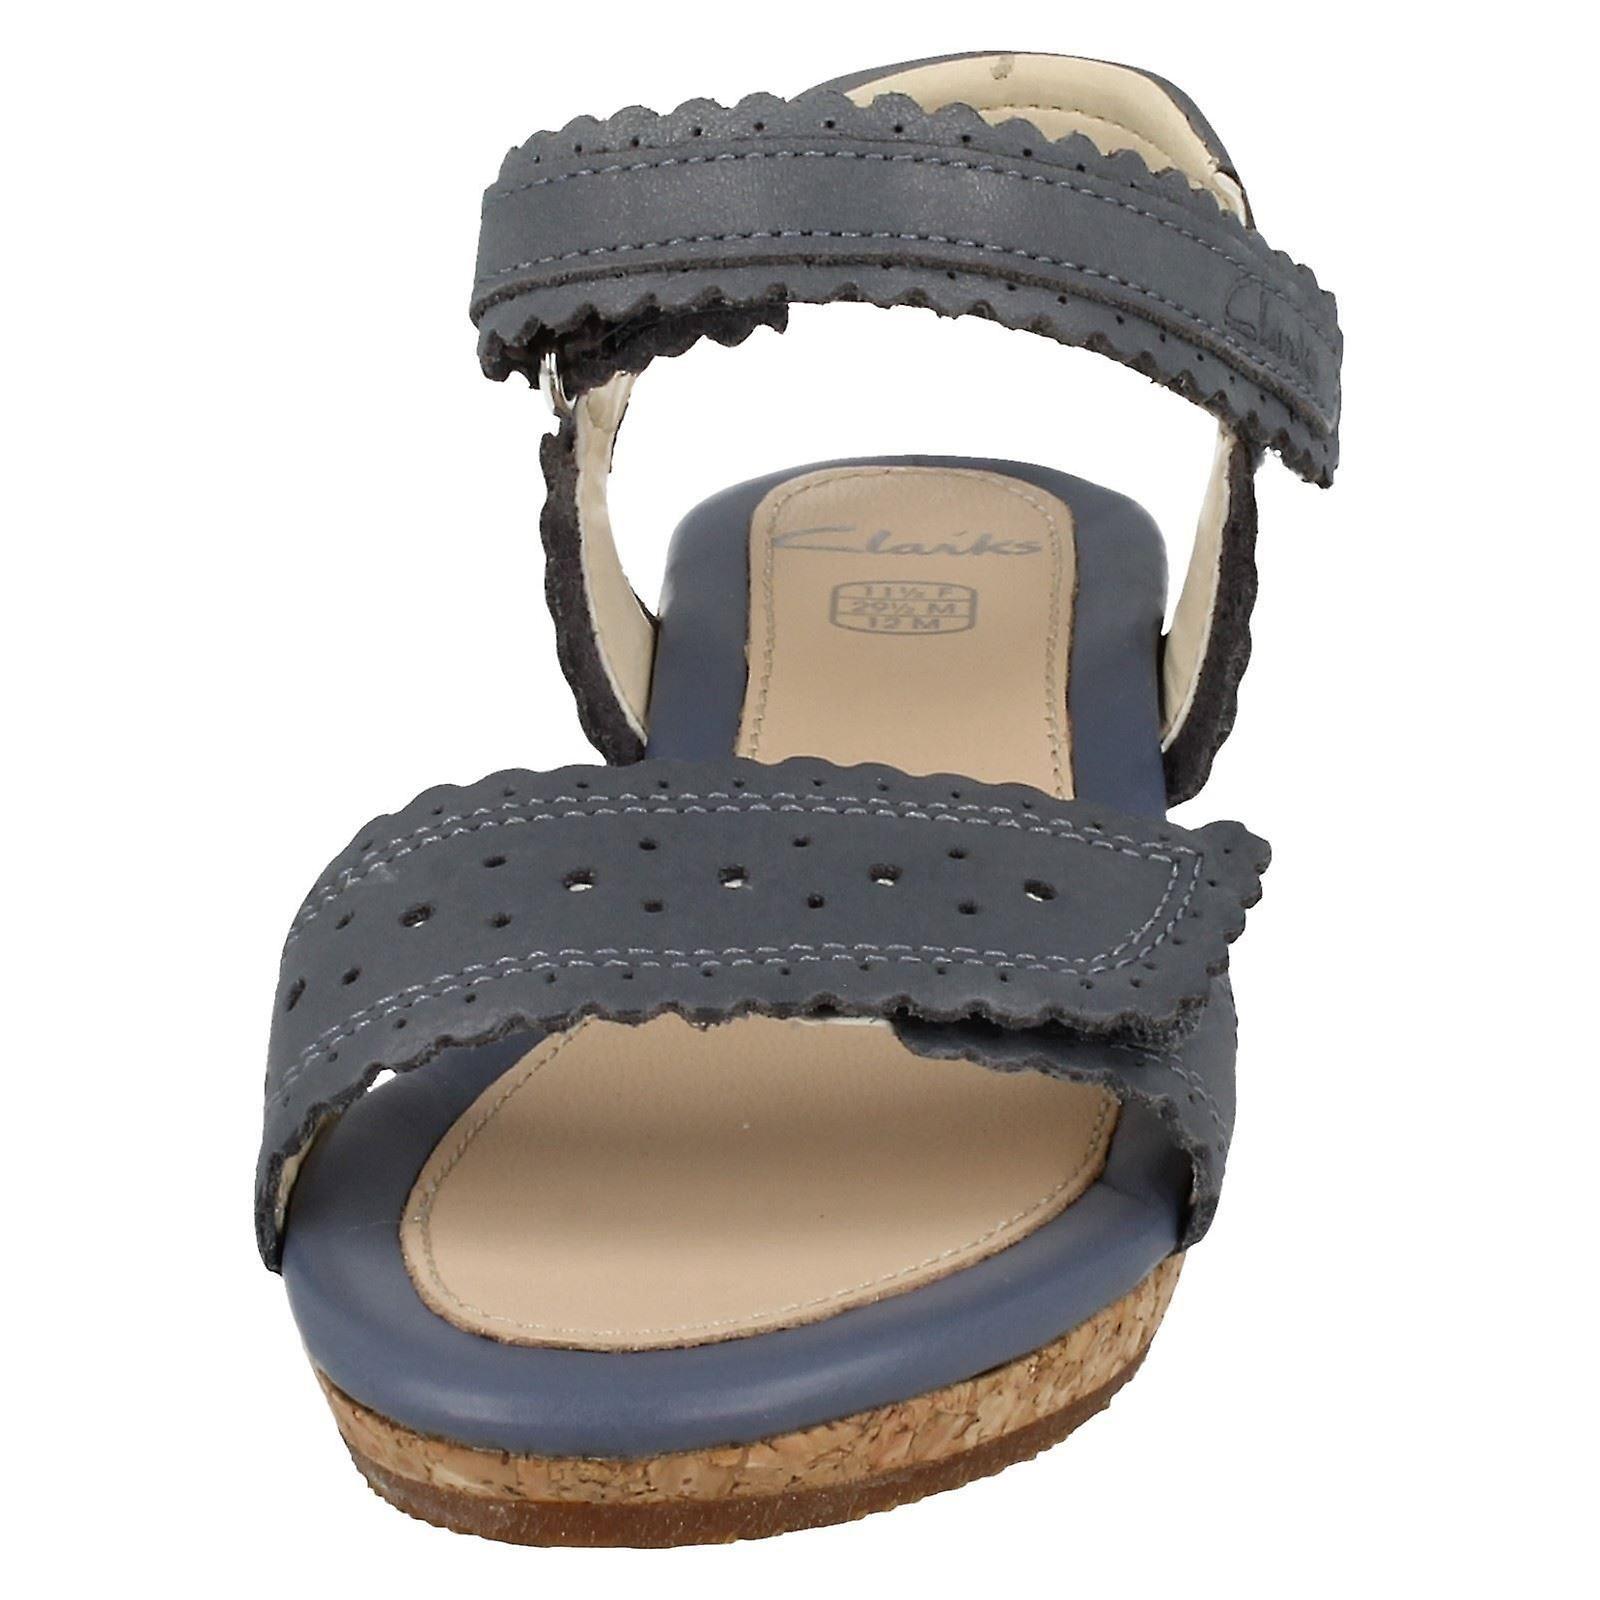 InfantJunior Girls Clarks Wedge Heel Summer Sandals Harpy Myth